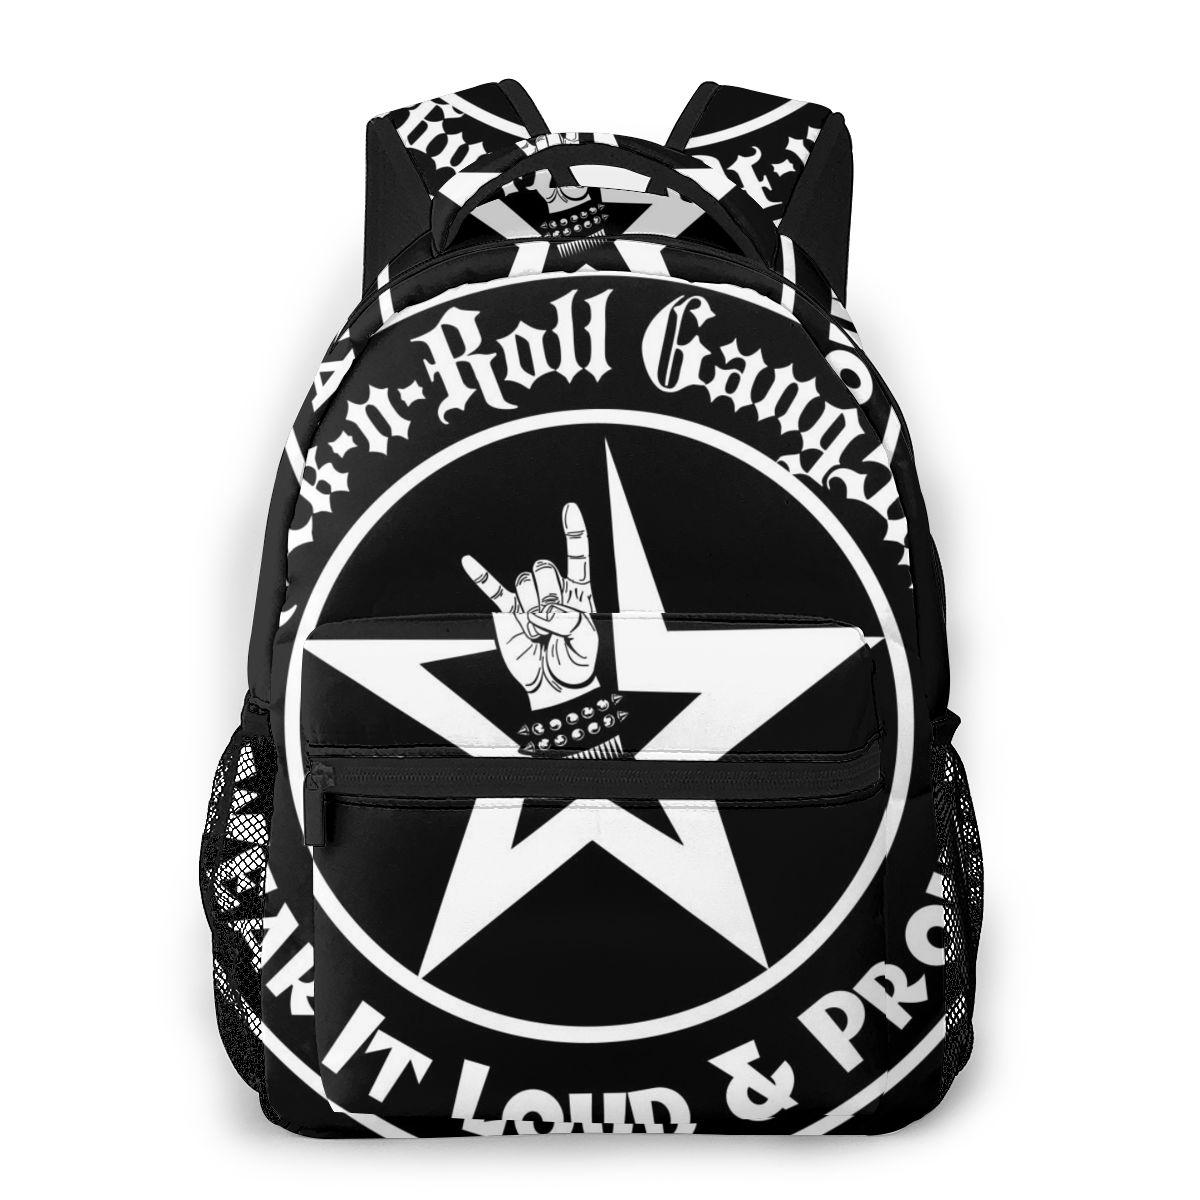 Rock N Roll-حقيبة ظهر مدرسية للمراهقات ، حقيبة كتف غير رسمية ، حقيبة سفر